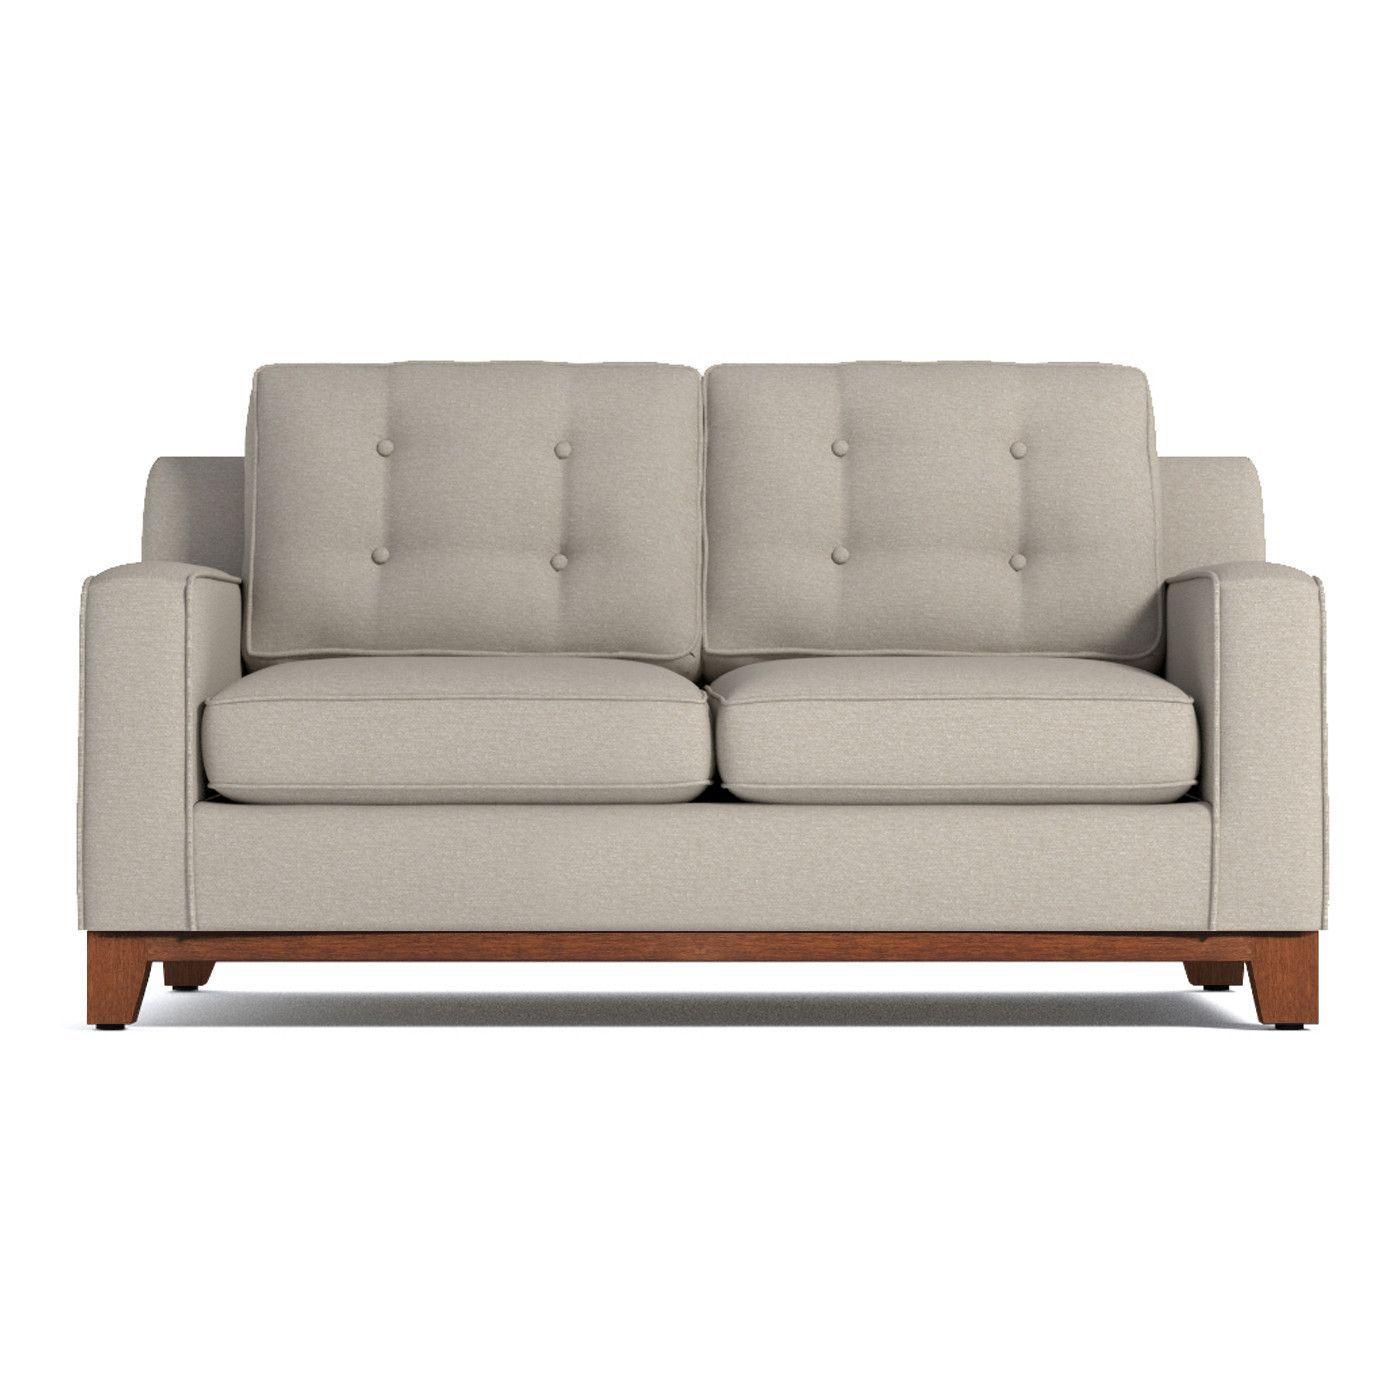 Brentwood Apartment Size Sofa Leg Finish Pecan Size